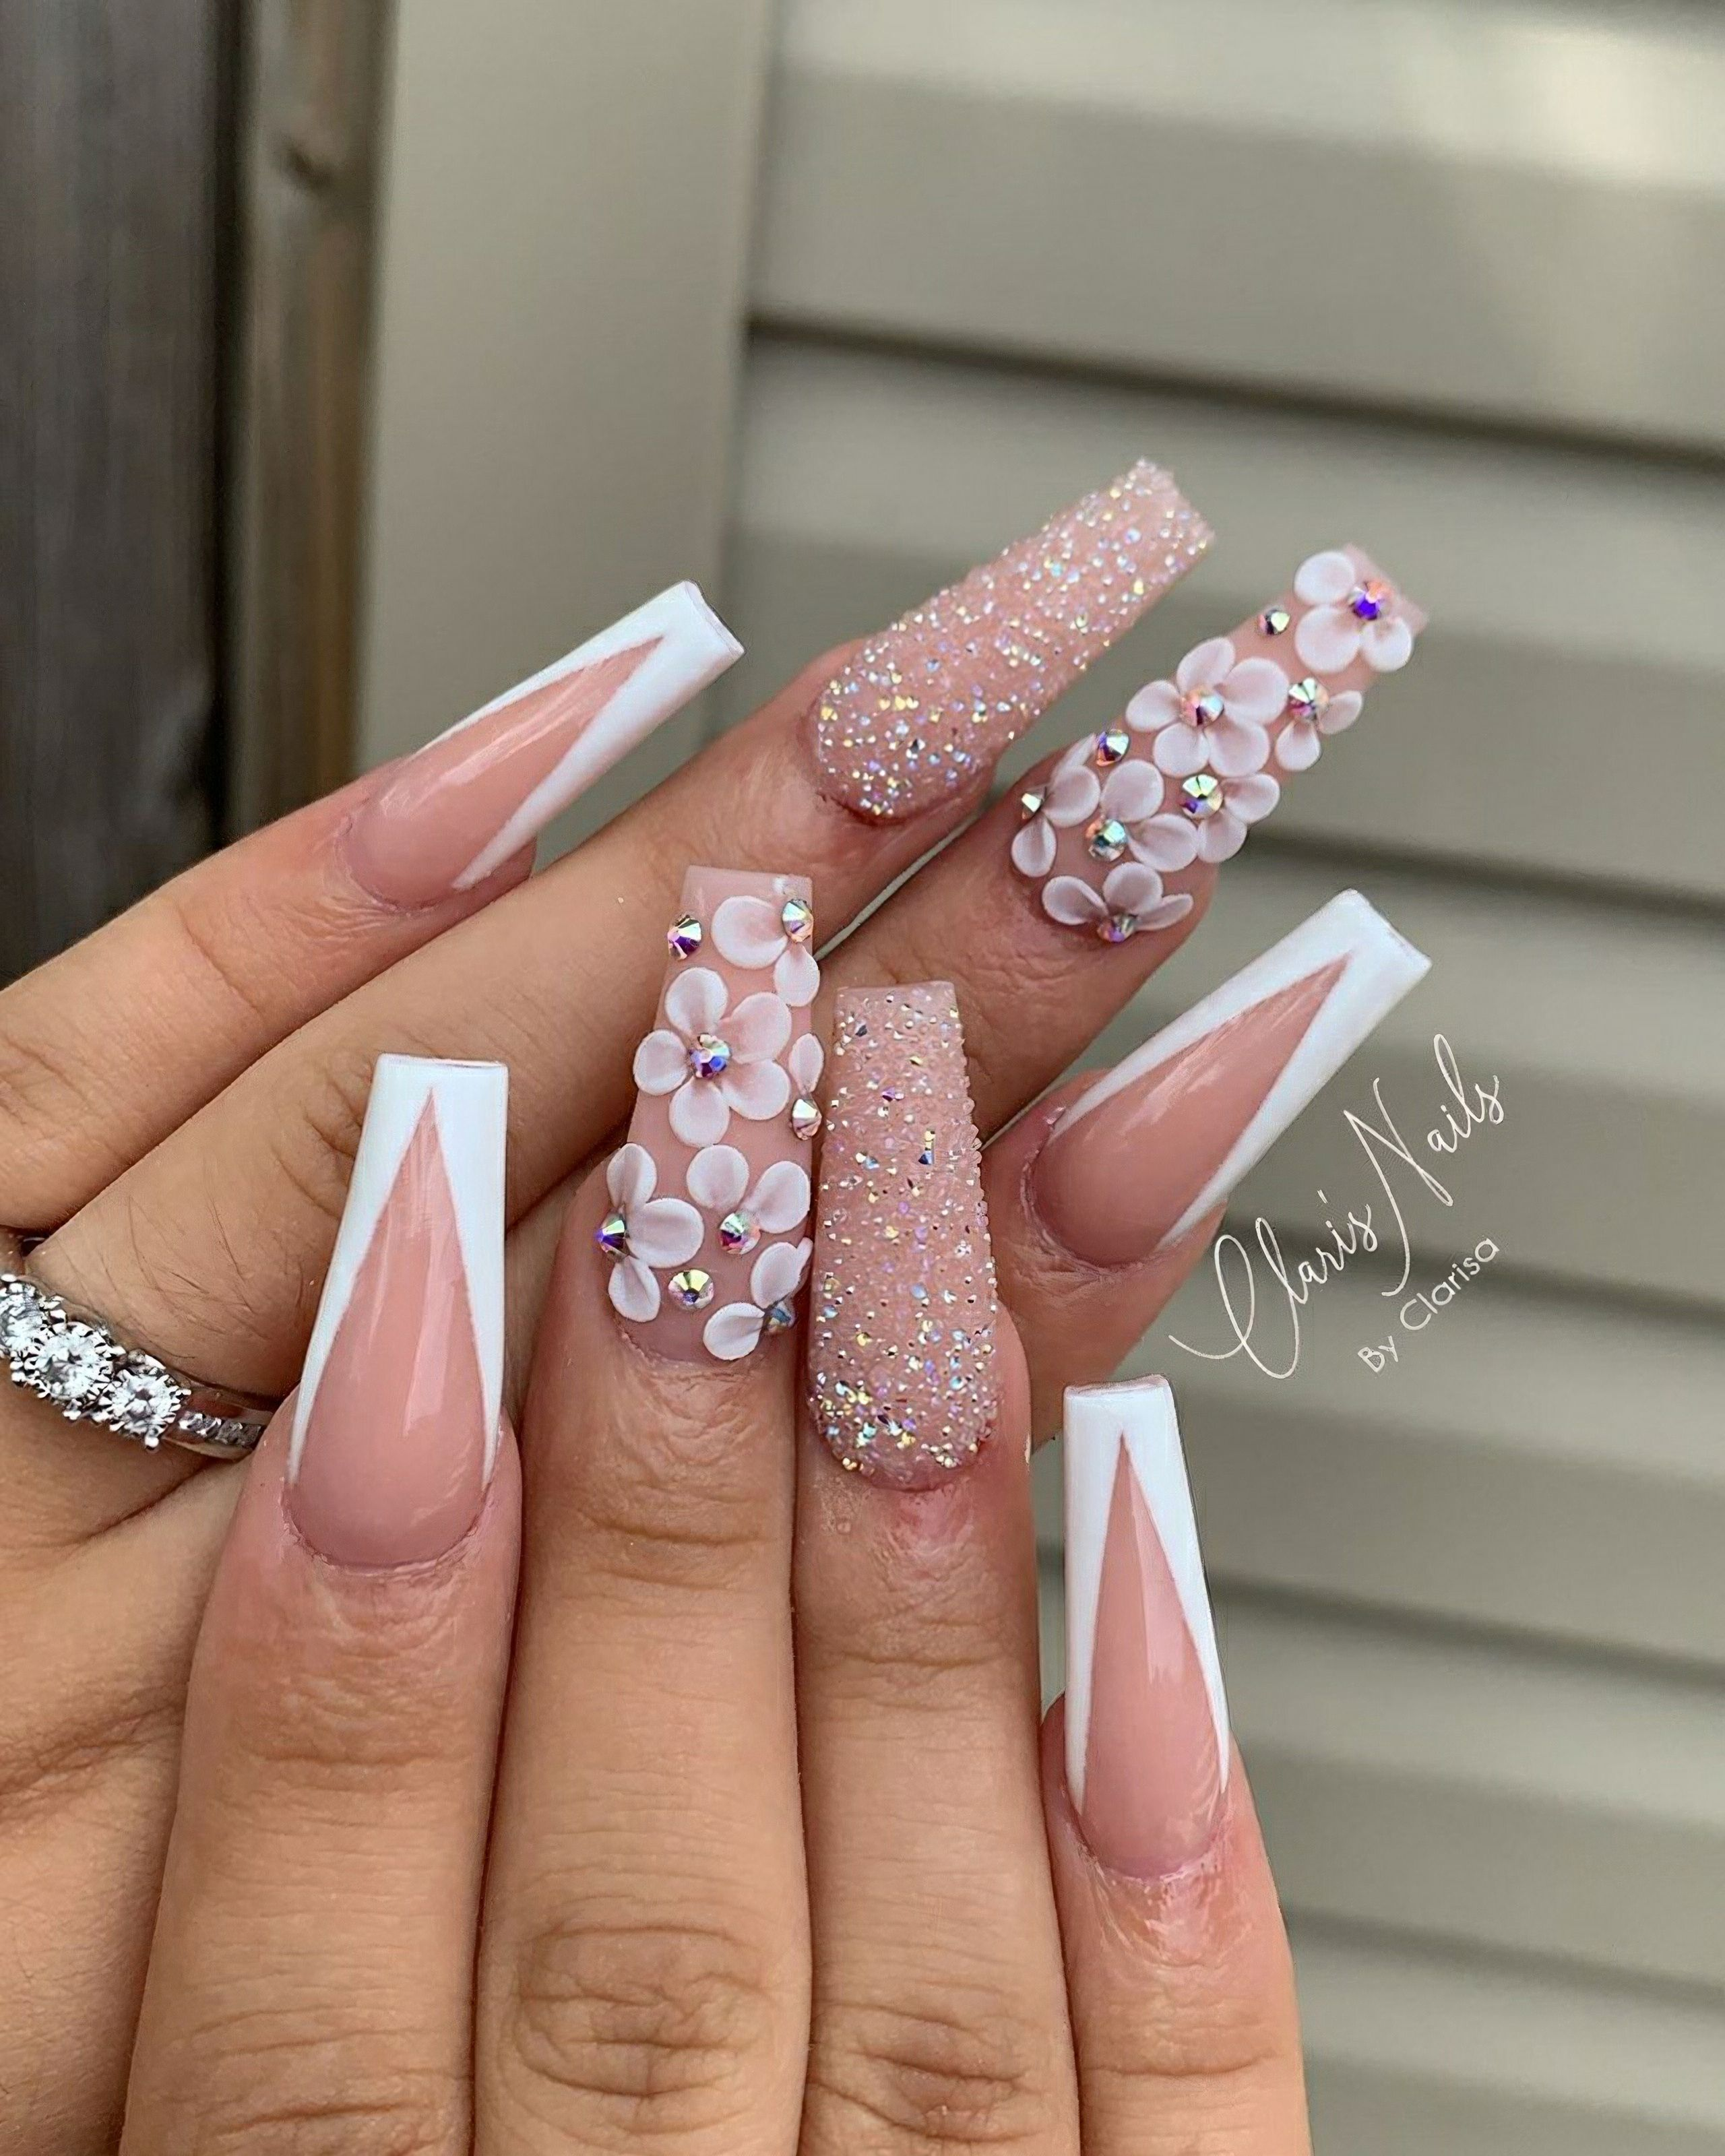 Amazon.com: fake nails - False Nails & Accessories